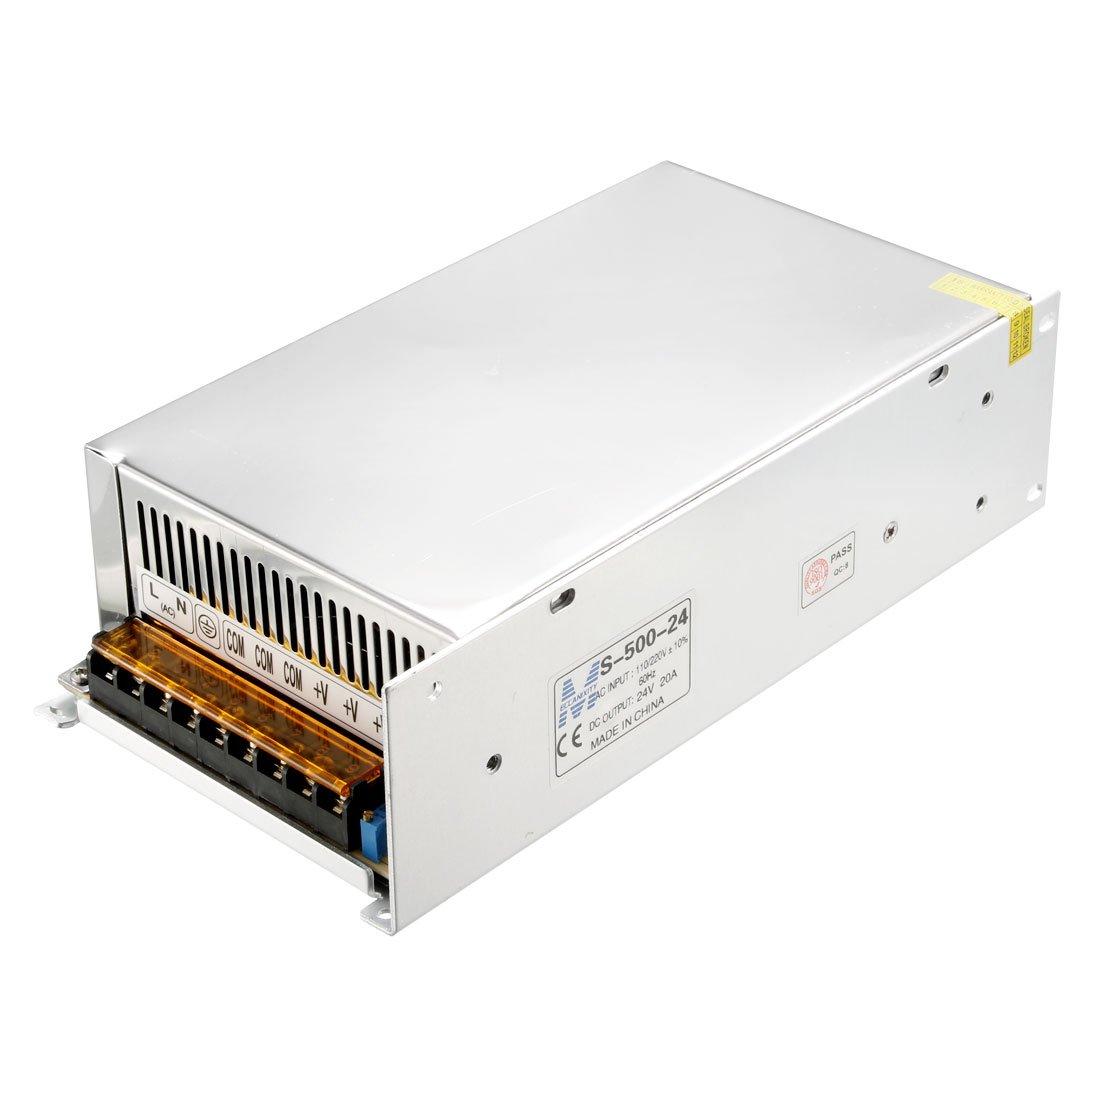 uxcell Switch Power Supply Driver S-480-24,AC 110V/220V to DC 24V 20A 480W for LED Strip Light